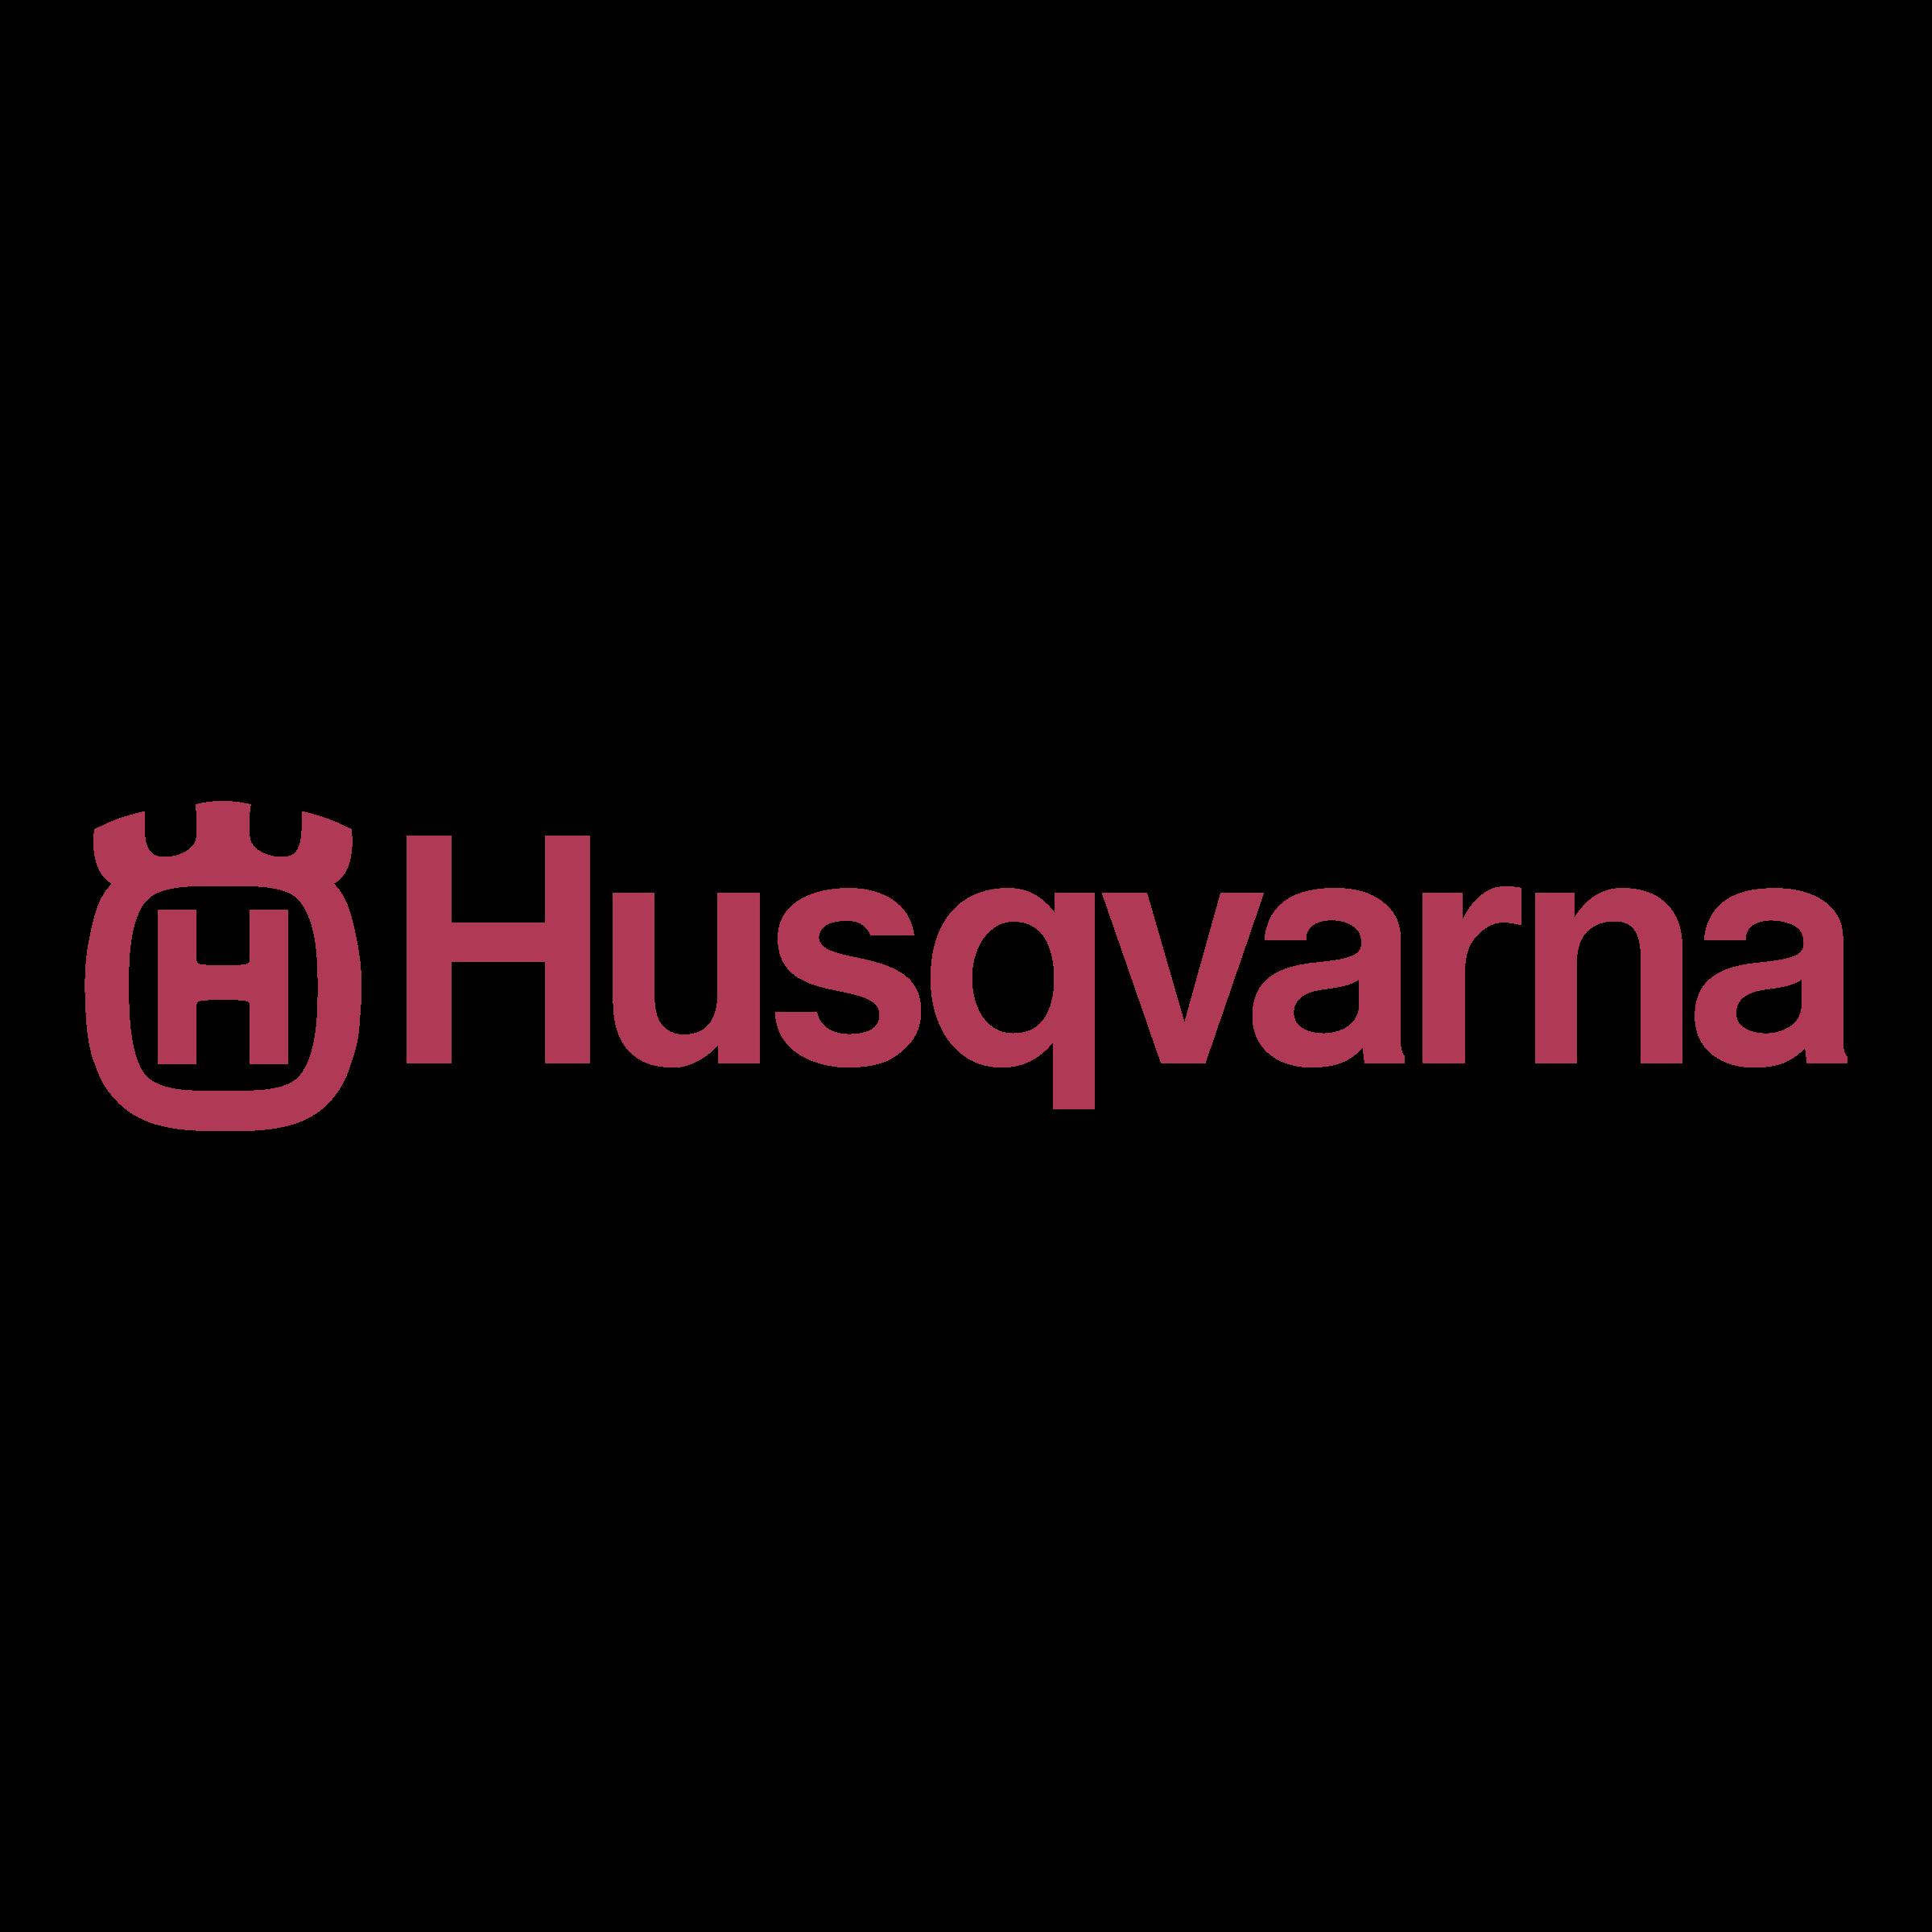 husqvarna-3-logo-png-transparent.png